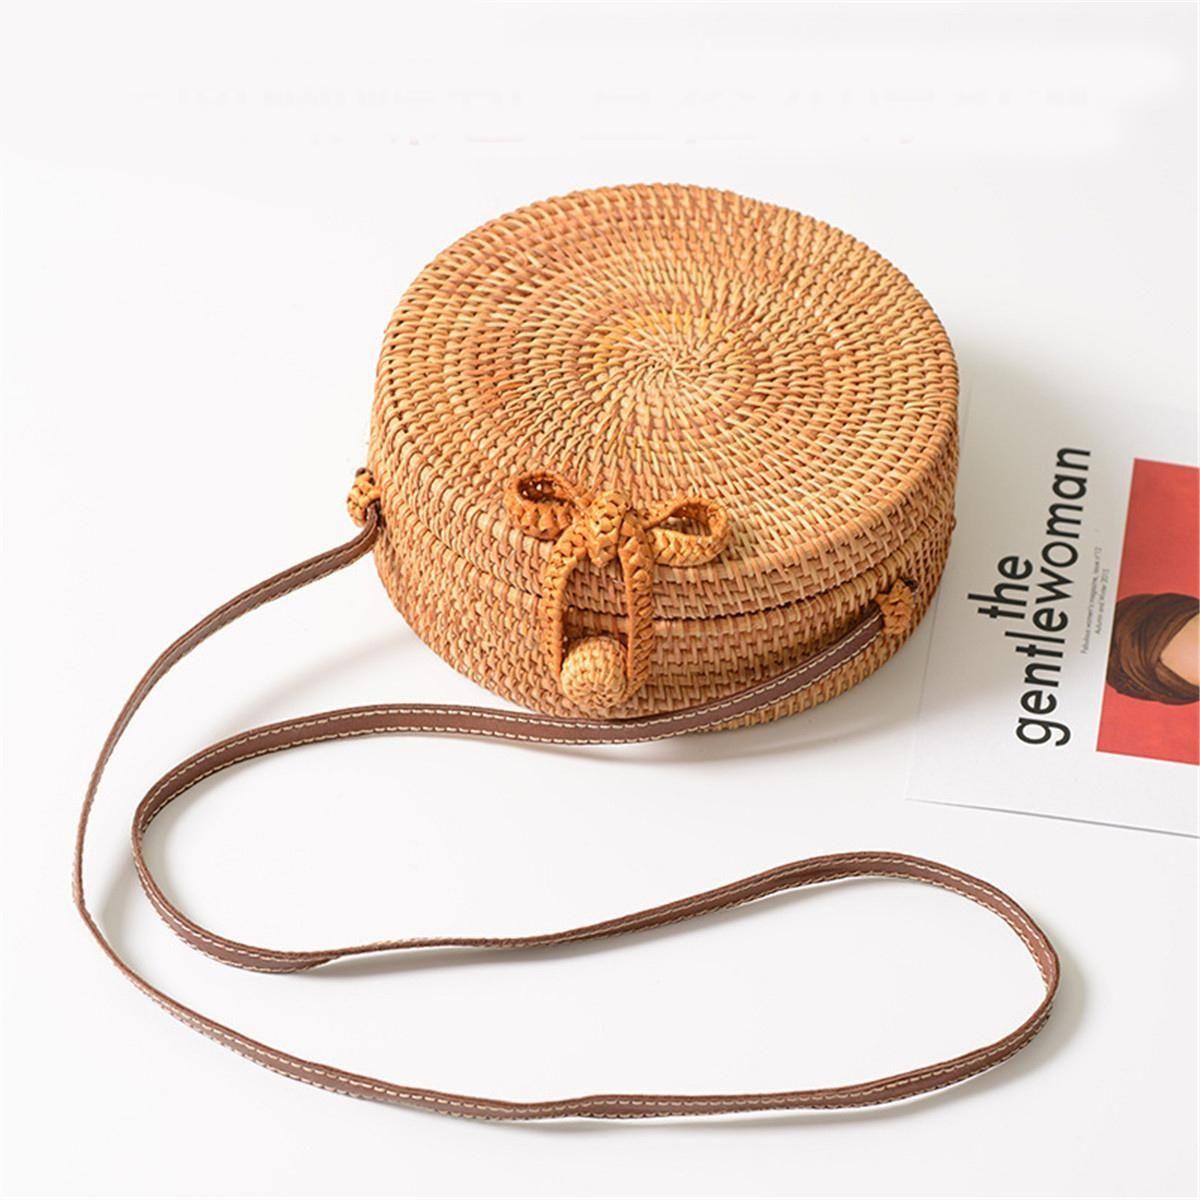 Buy Generic Straw Handbag Rattan Handmade Woven Round Summer Beach Knitted  Bag Bohemia Gift in Egypt 80ce7626659a2